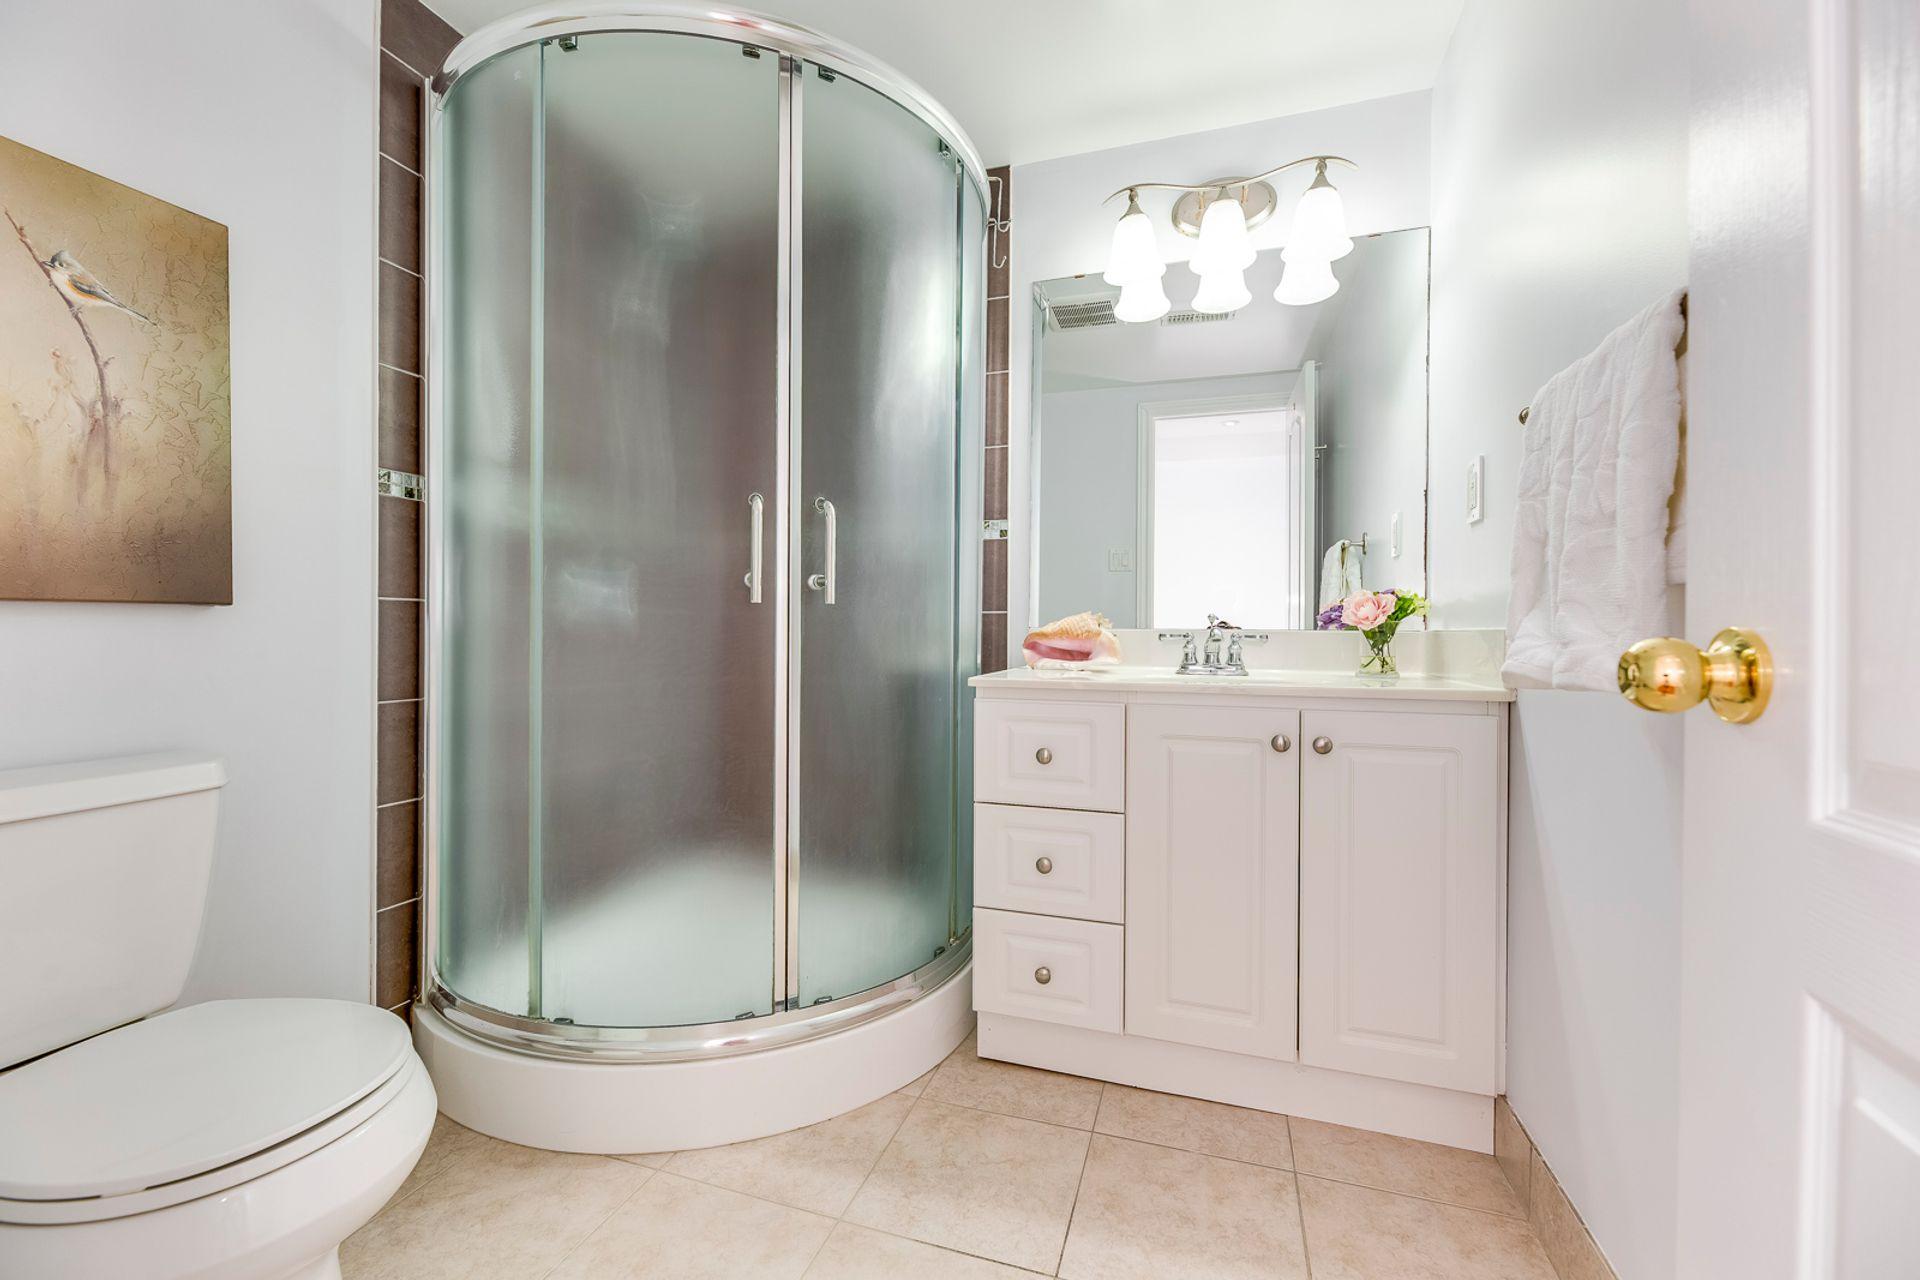 Basement Bathroom - 200 Lexington Rd, Oakville - Elite3 & Team at 200 Lexington Road, River Oaks, Oakville